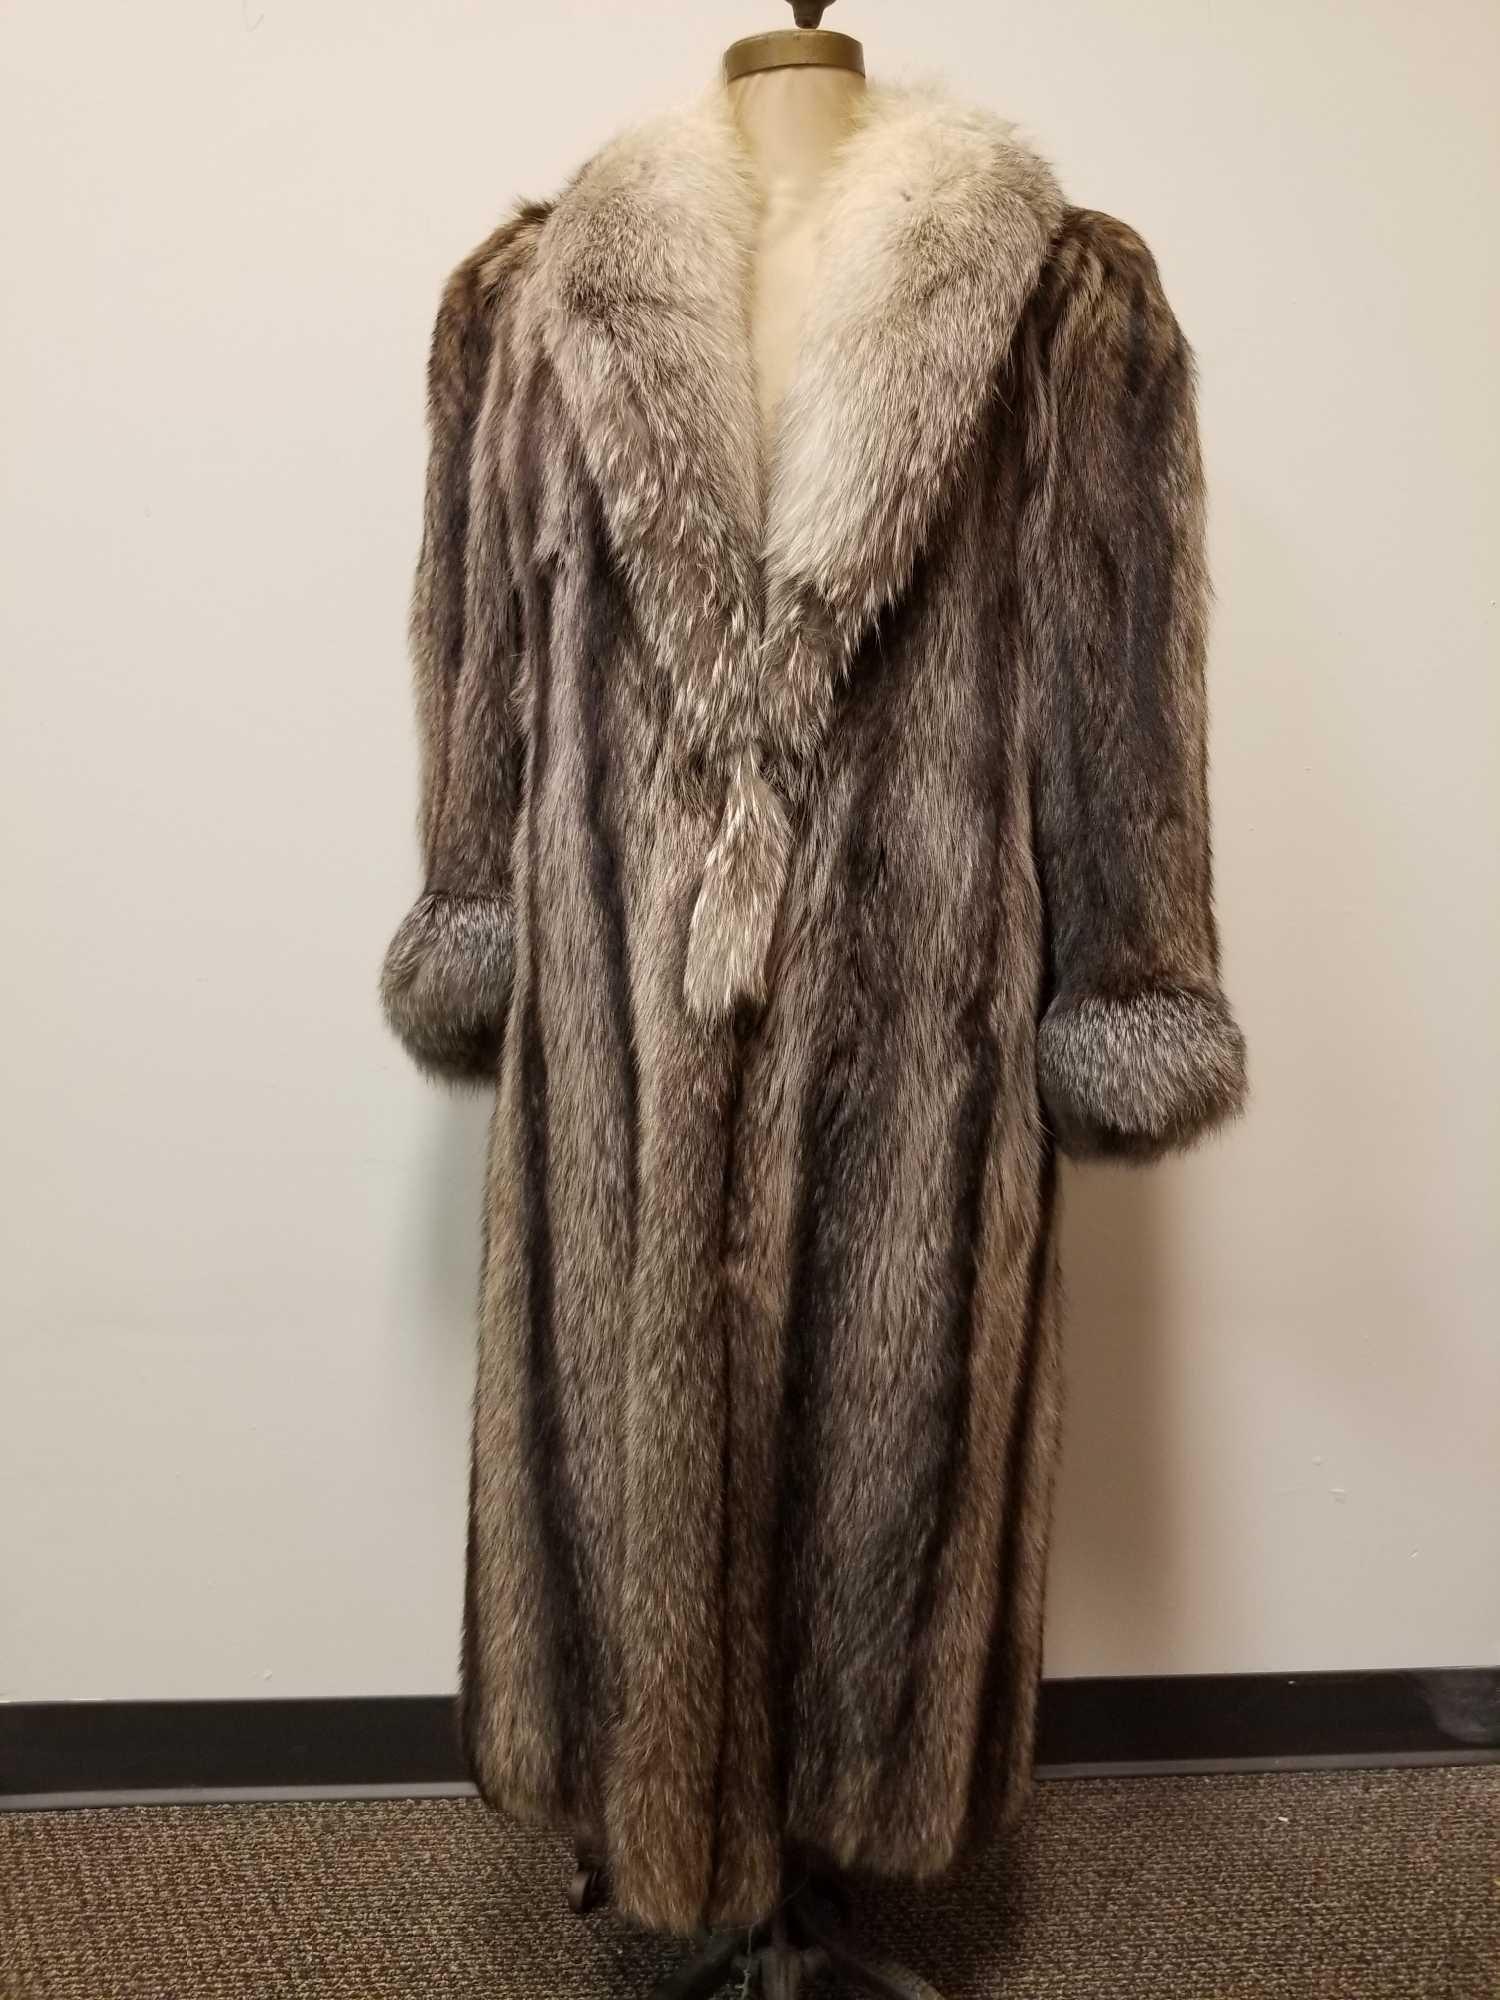 Diamond Distinctive Design Fur Coat